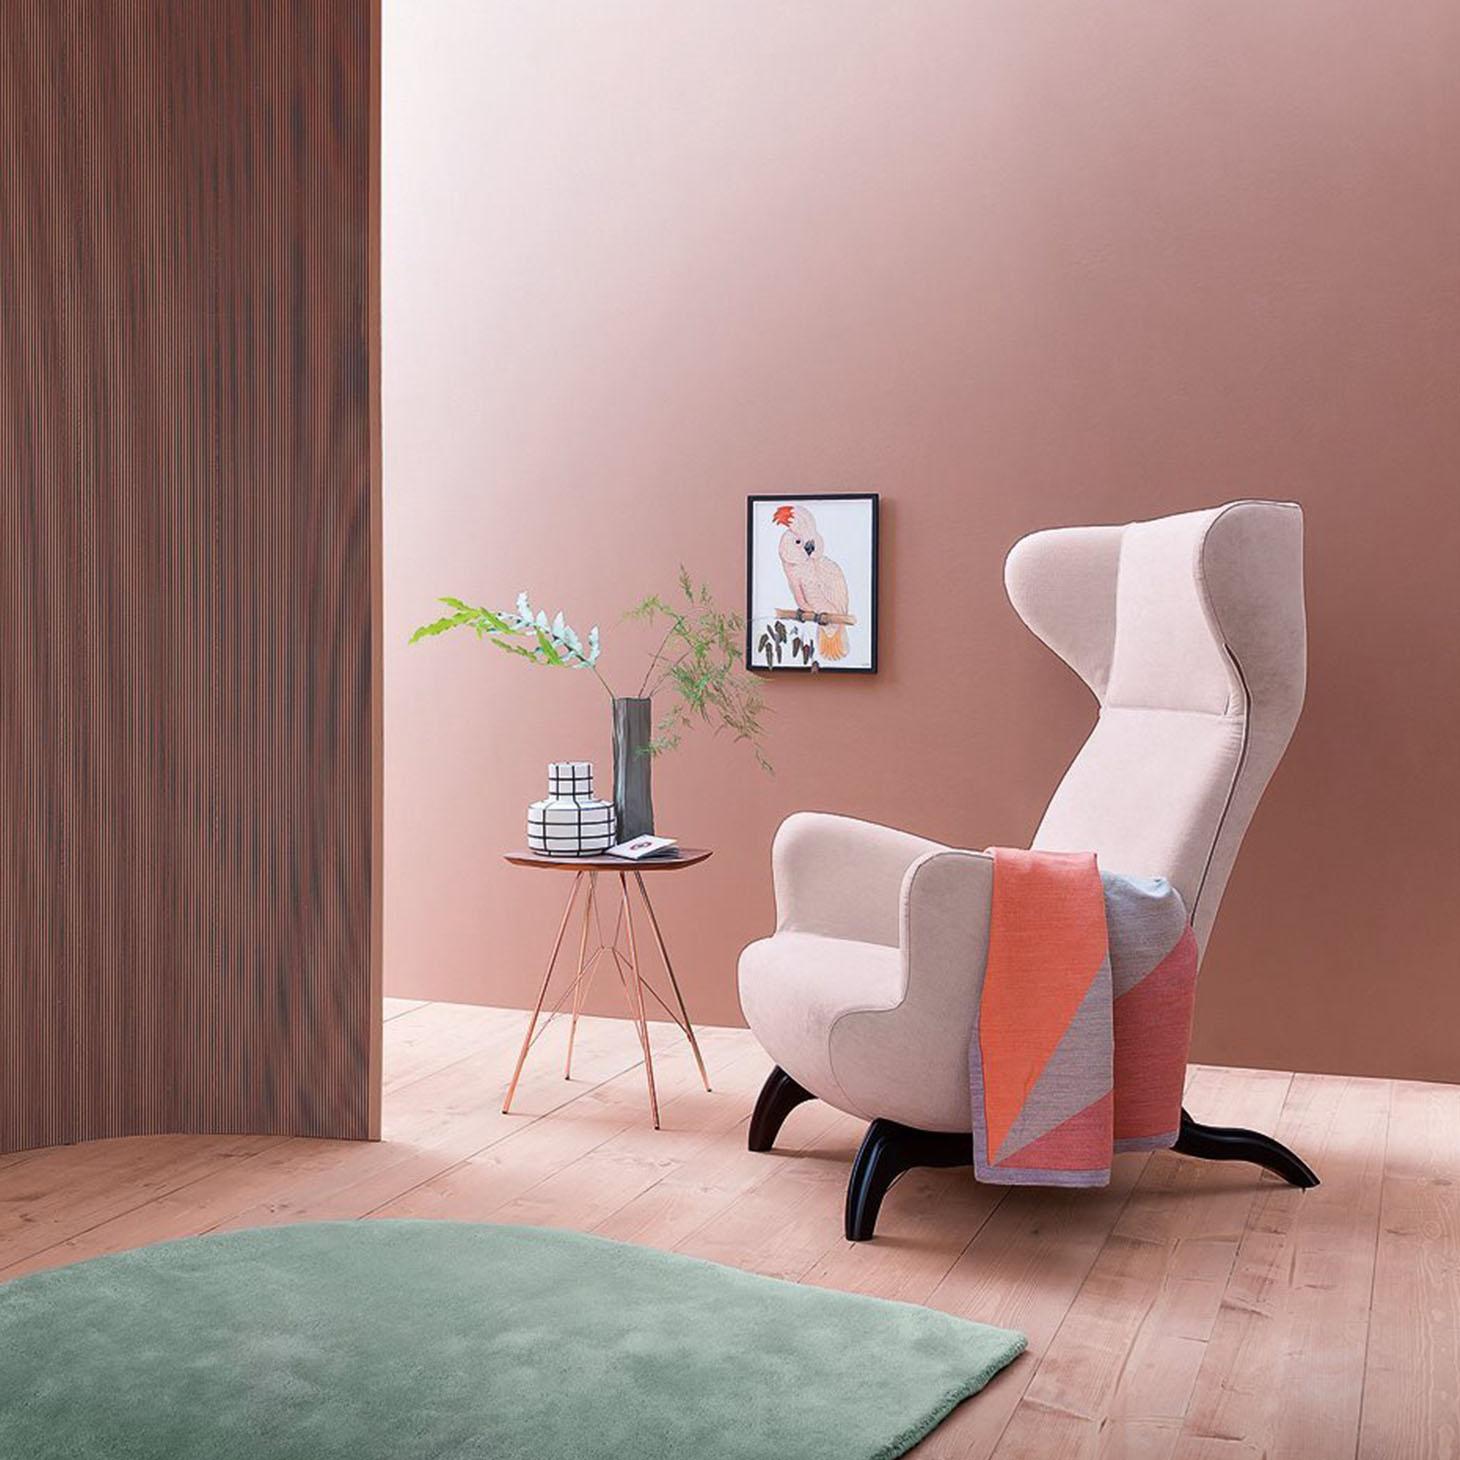 Ardea lounge chair, homage to Carlo Molino